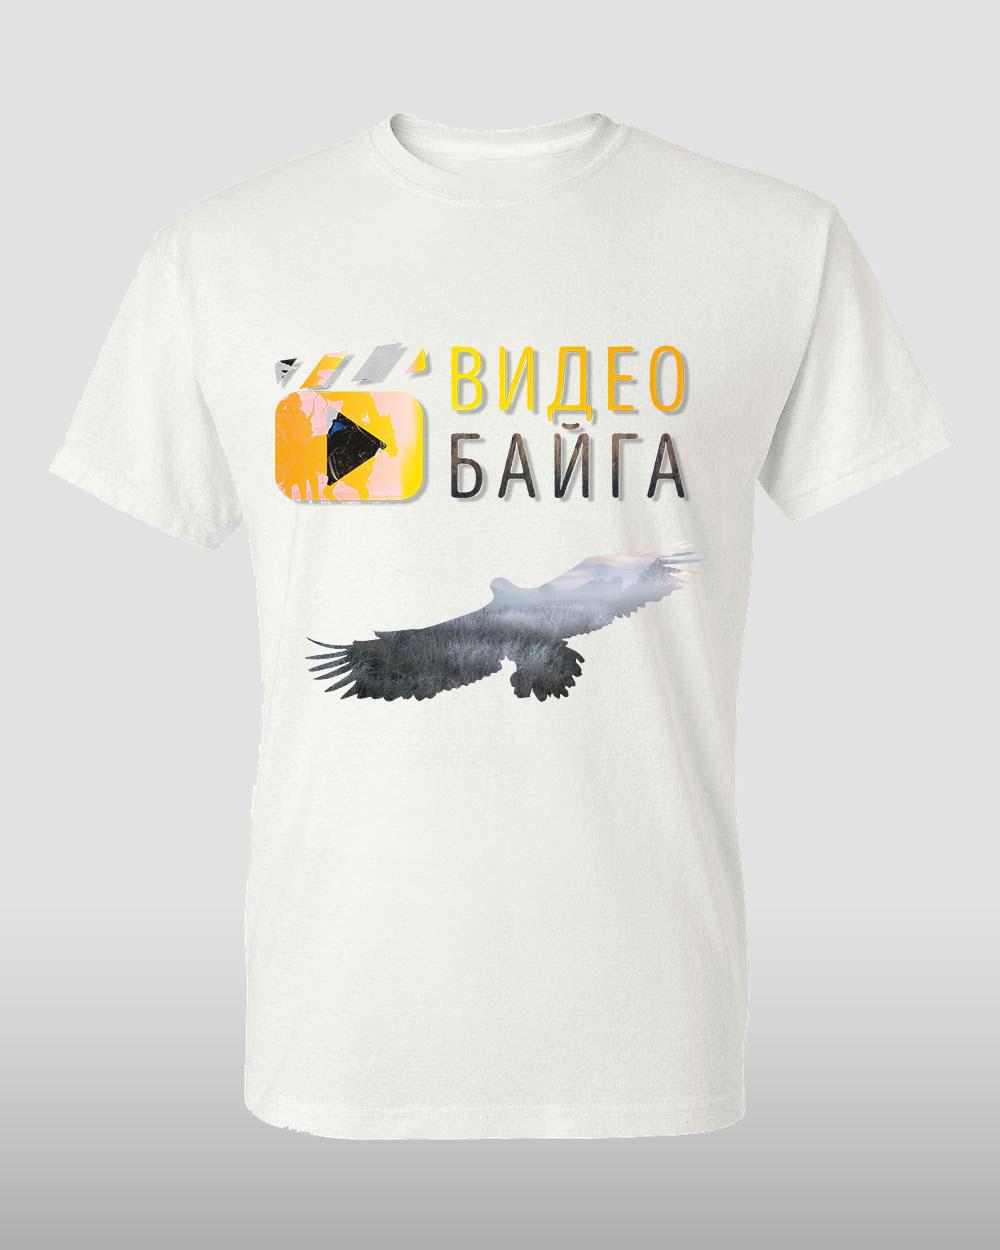 Дизайн принта на футболки для фестиваля YouTube блогеров  фото f_7925b46074323ccb.jpg